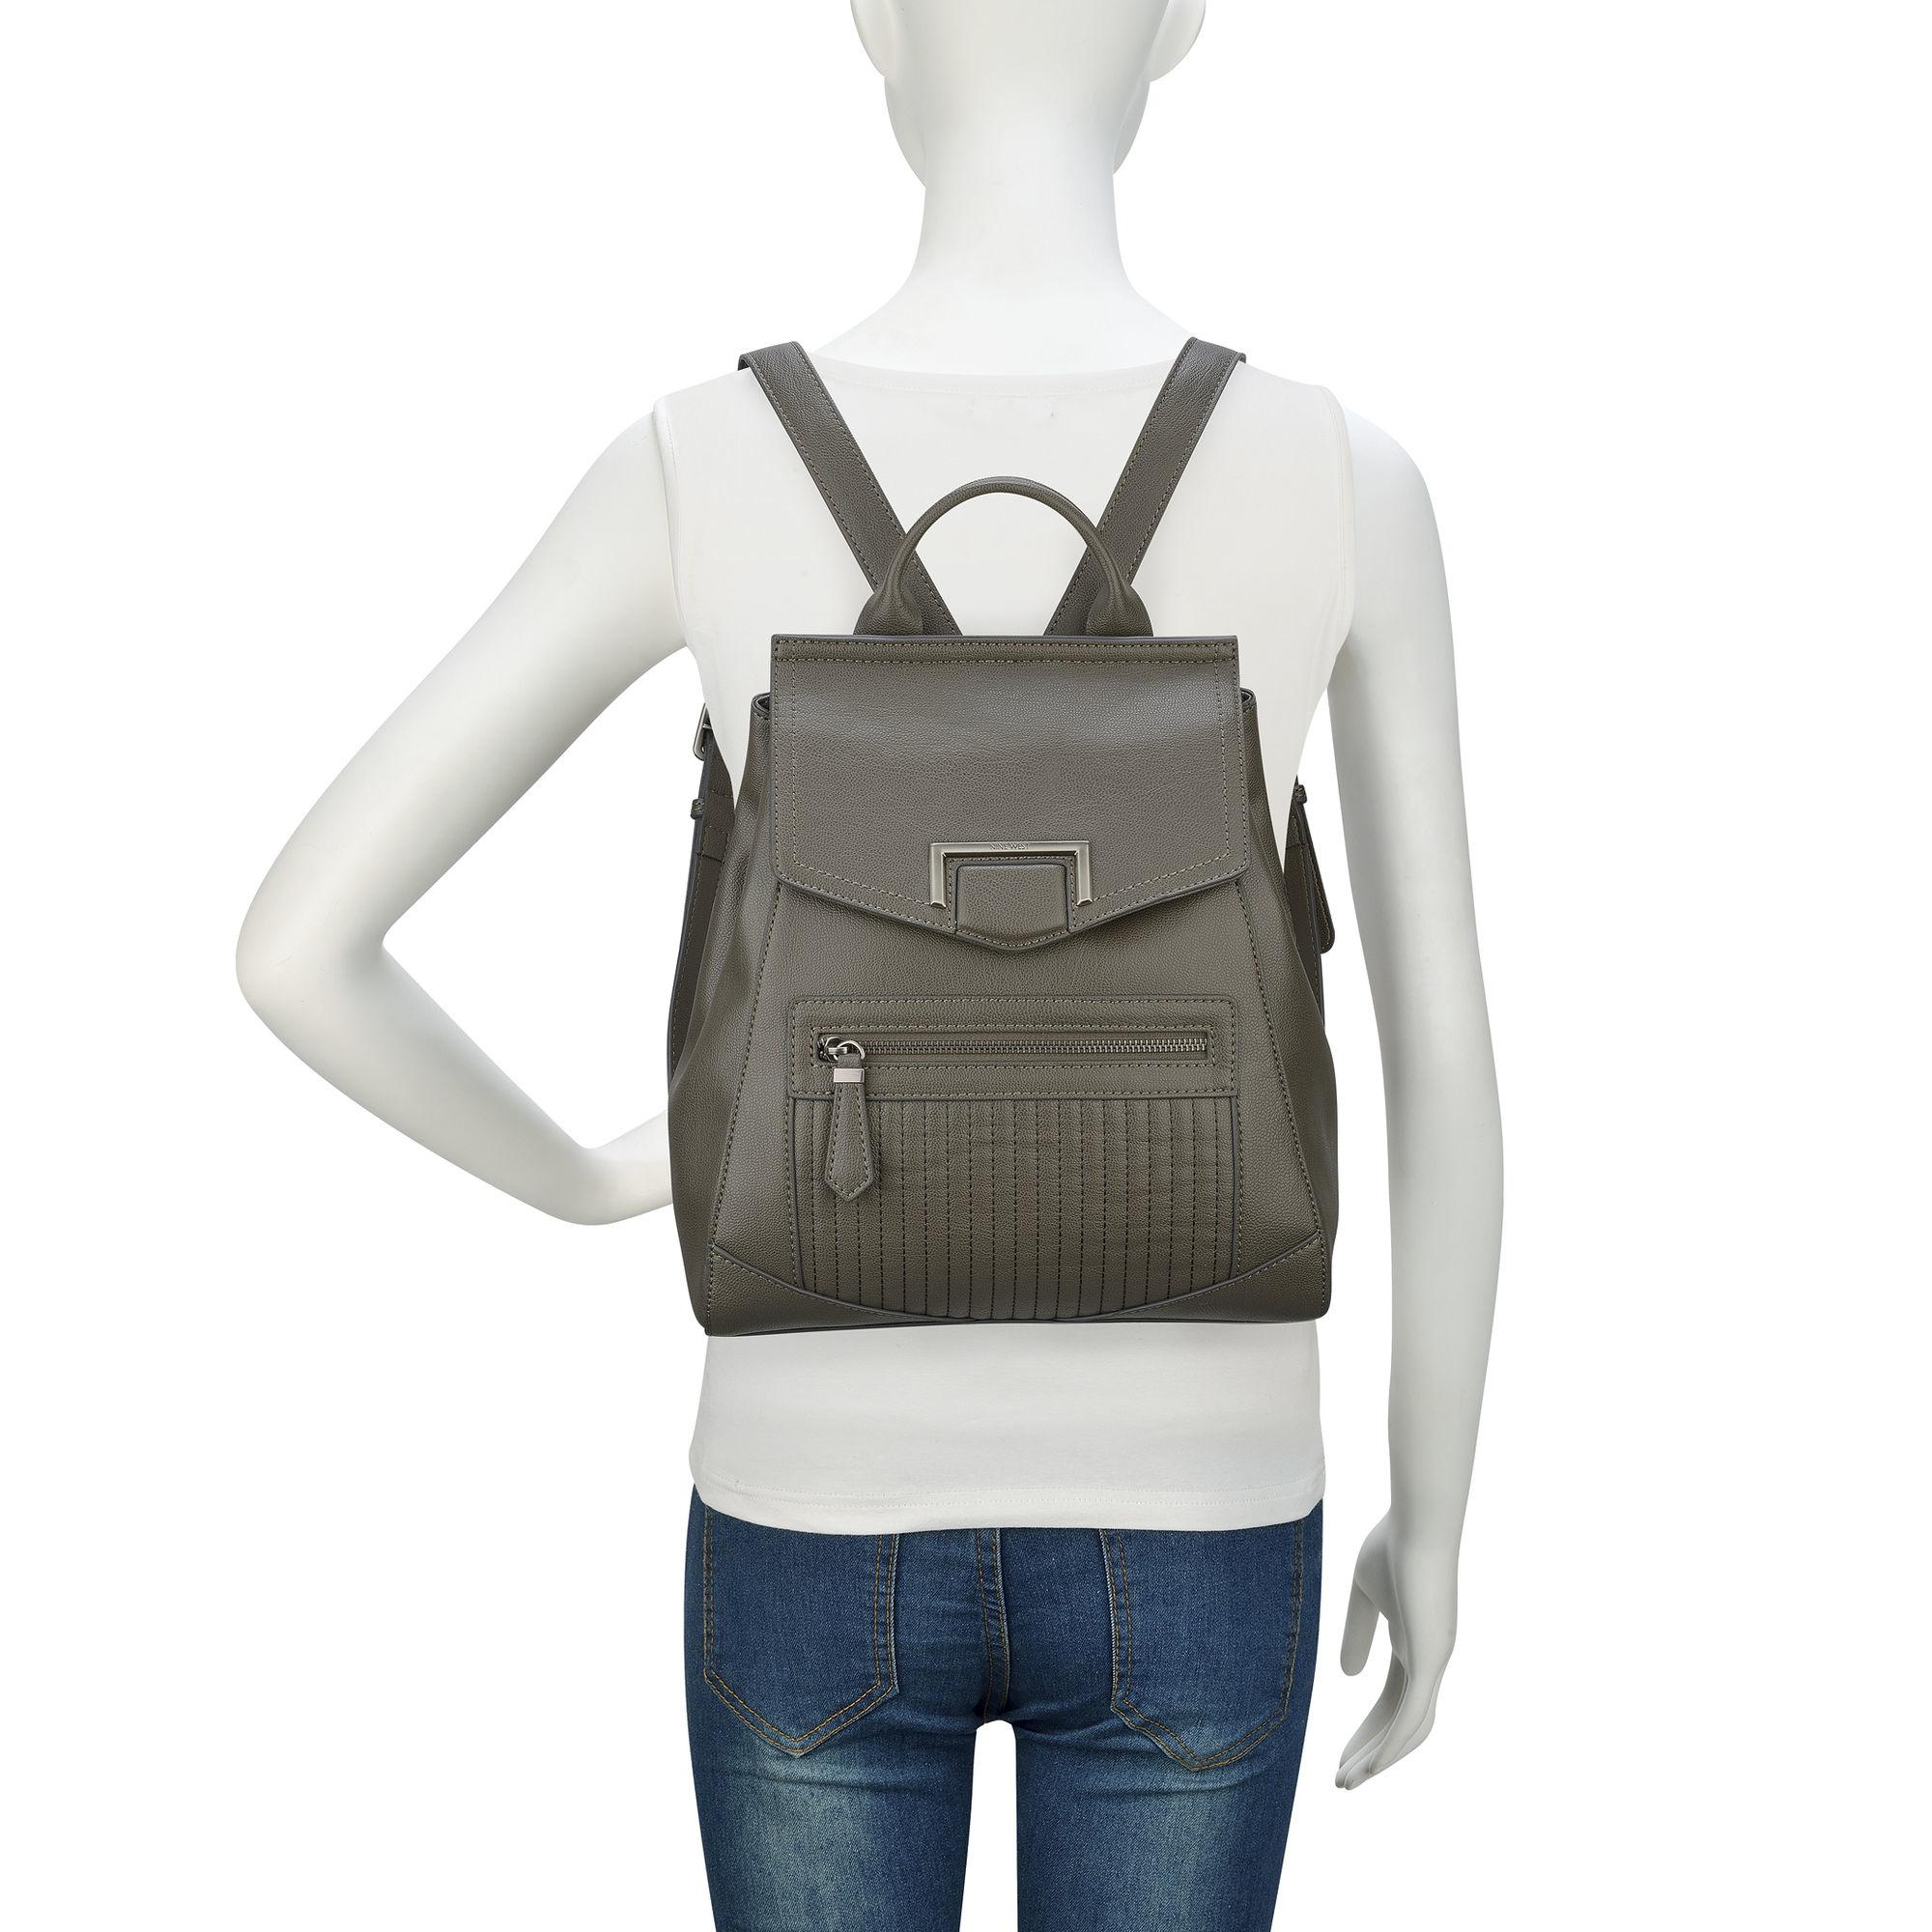 Sling bag nine west - Gallery